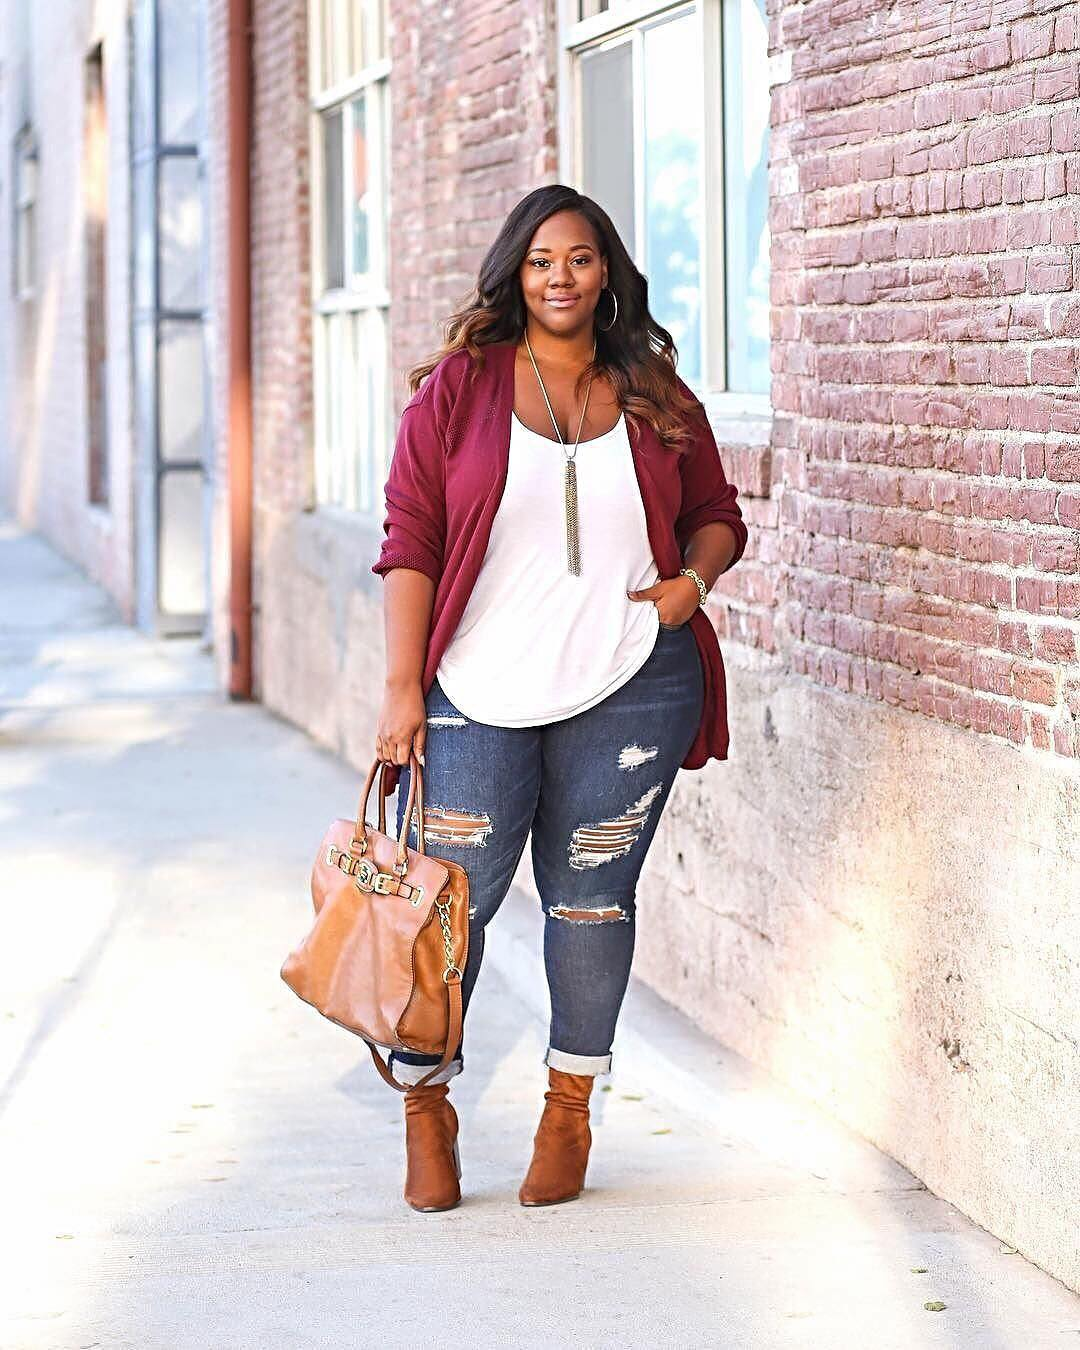 235c5b4d62fd Heading out on a First date? Here's a Few Plus Size Outfit Ideas